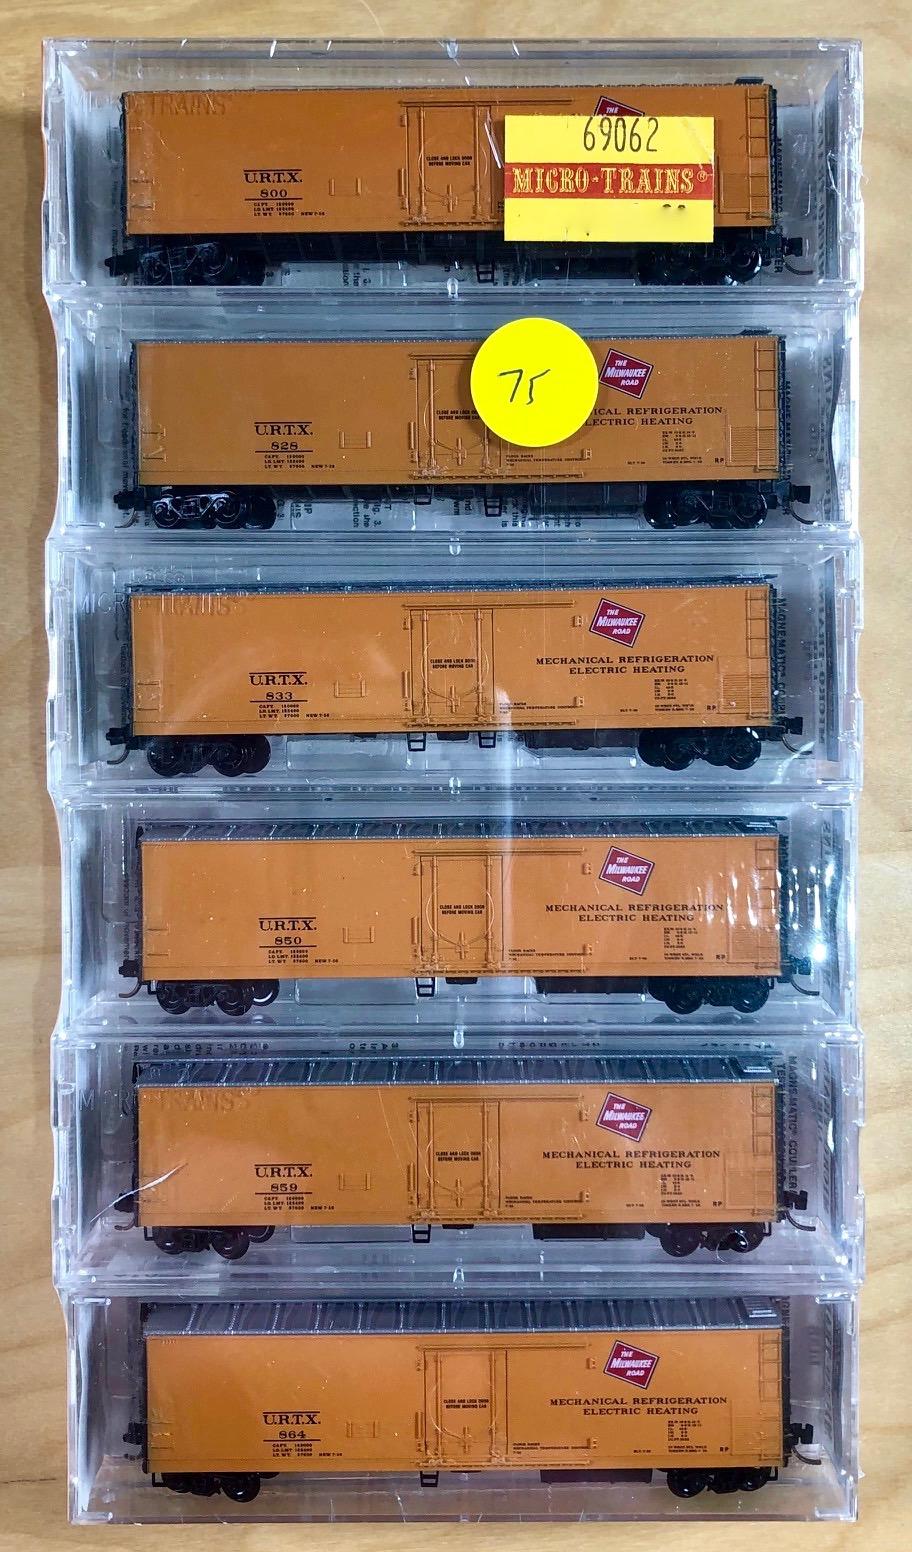 N Scale - Micro-Trains - 69062 - Reefer, 50 Foot, Mechanical - Milwaukee Road - 6-Pack